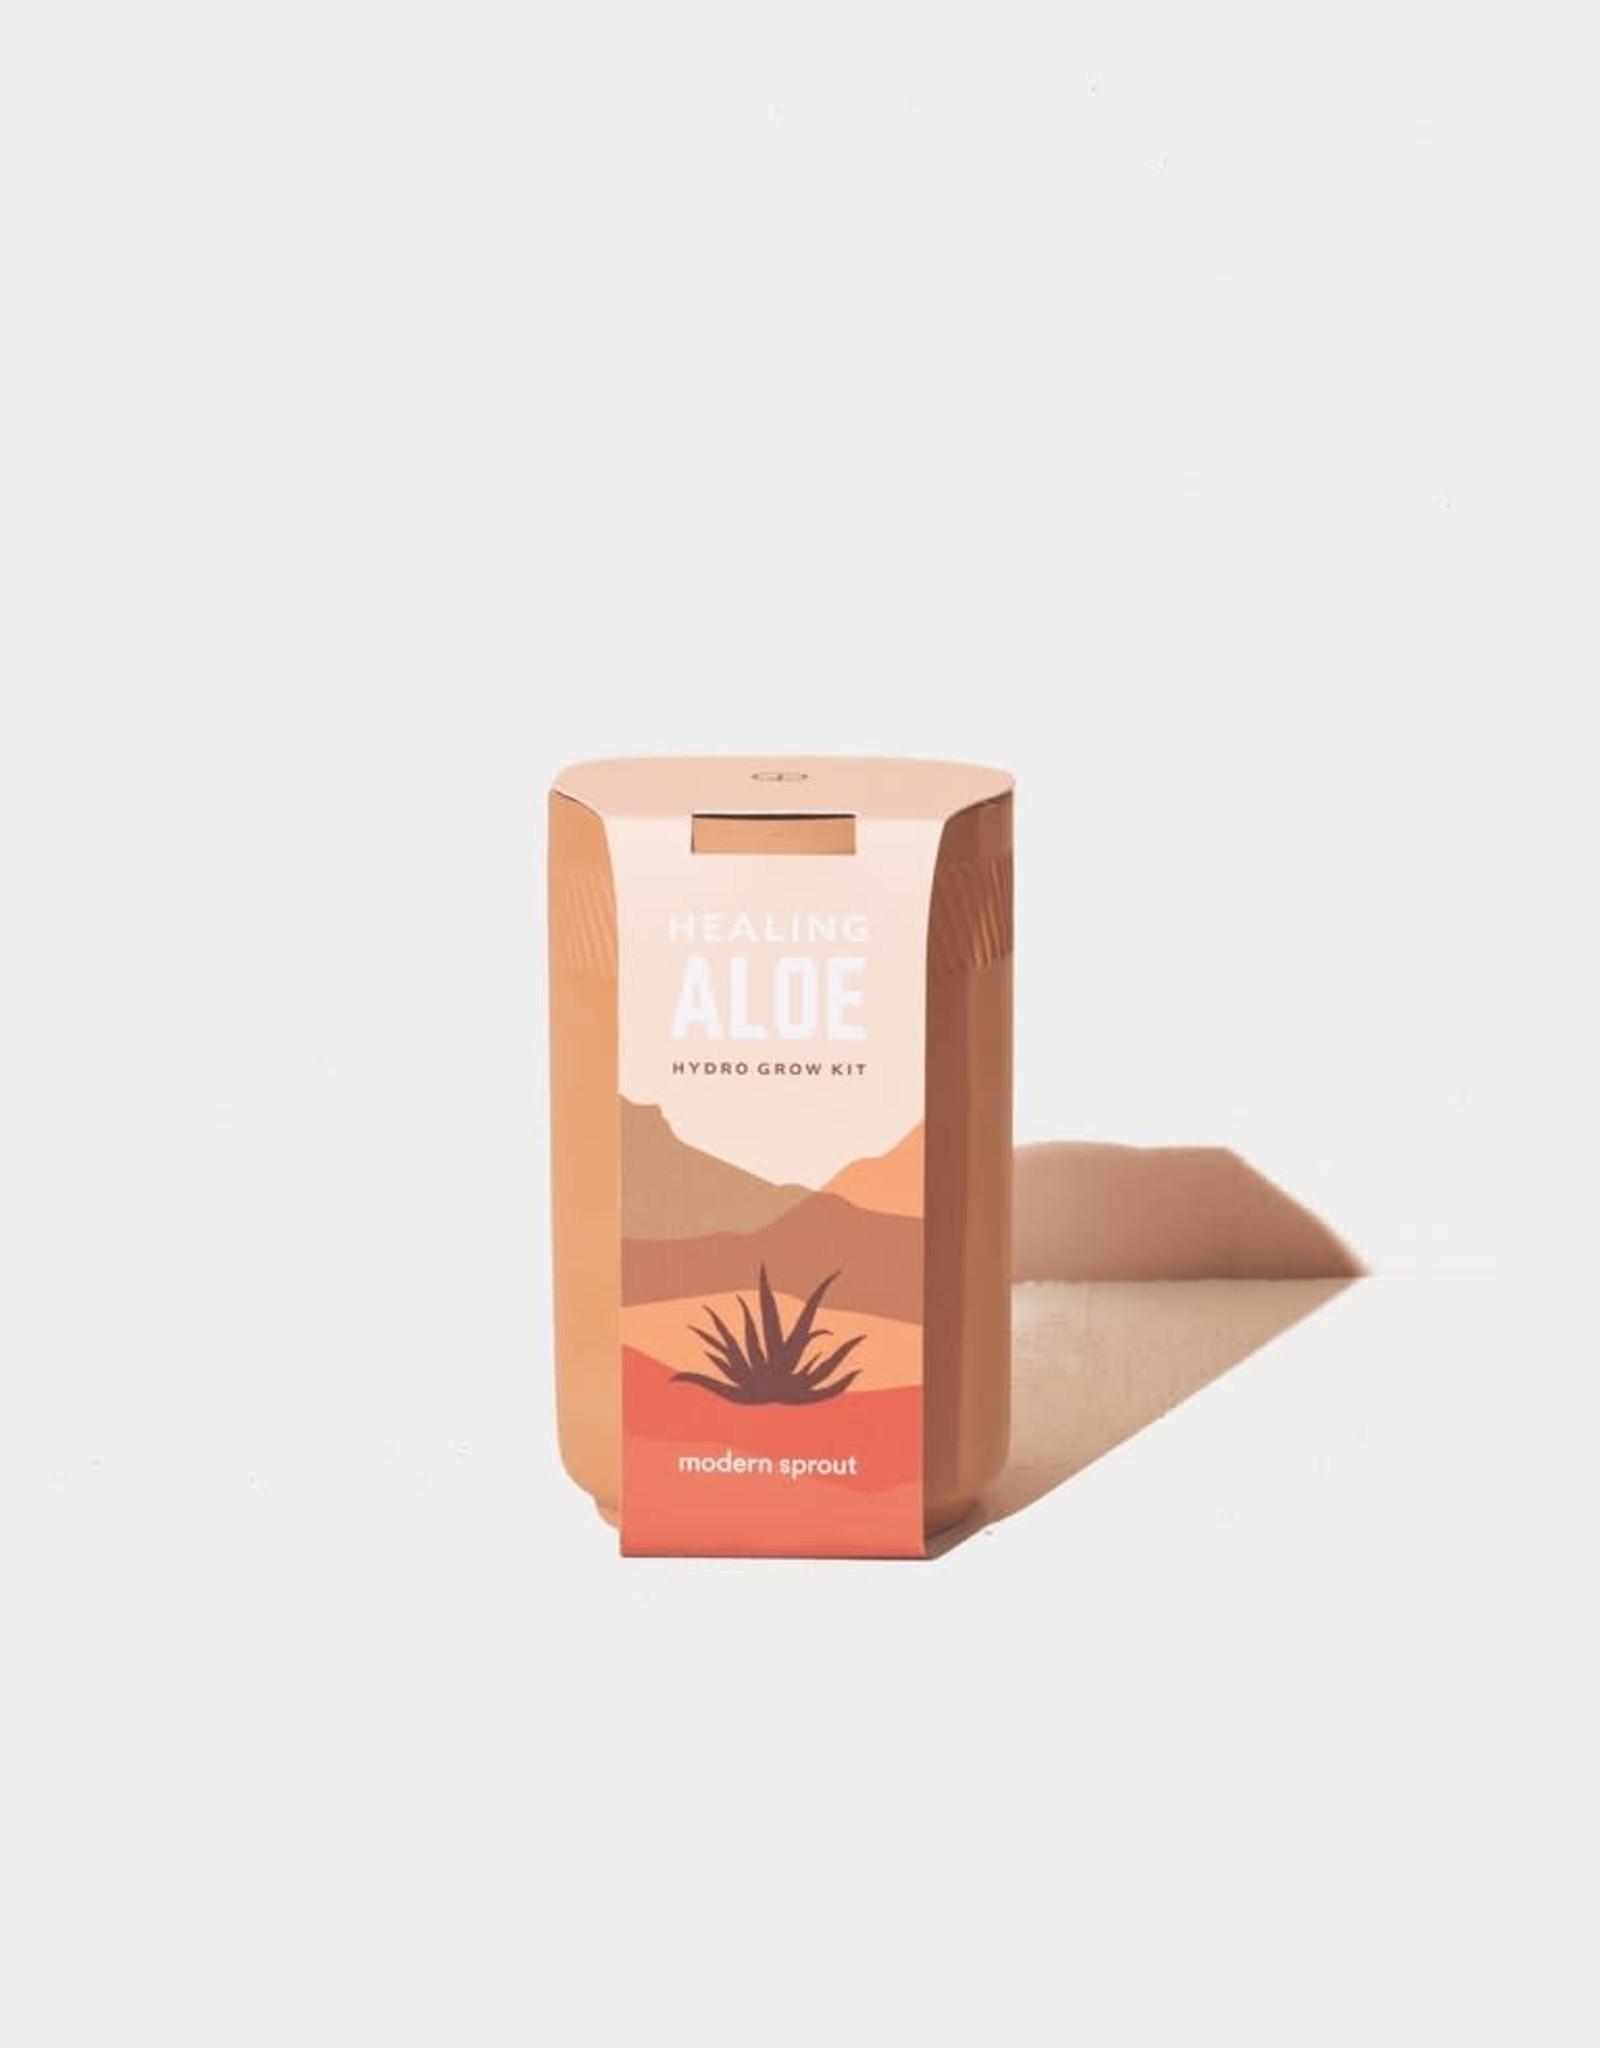 Aloe Growing Kit